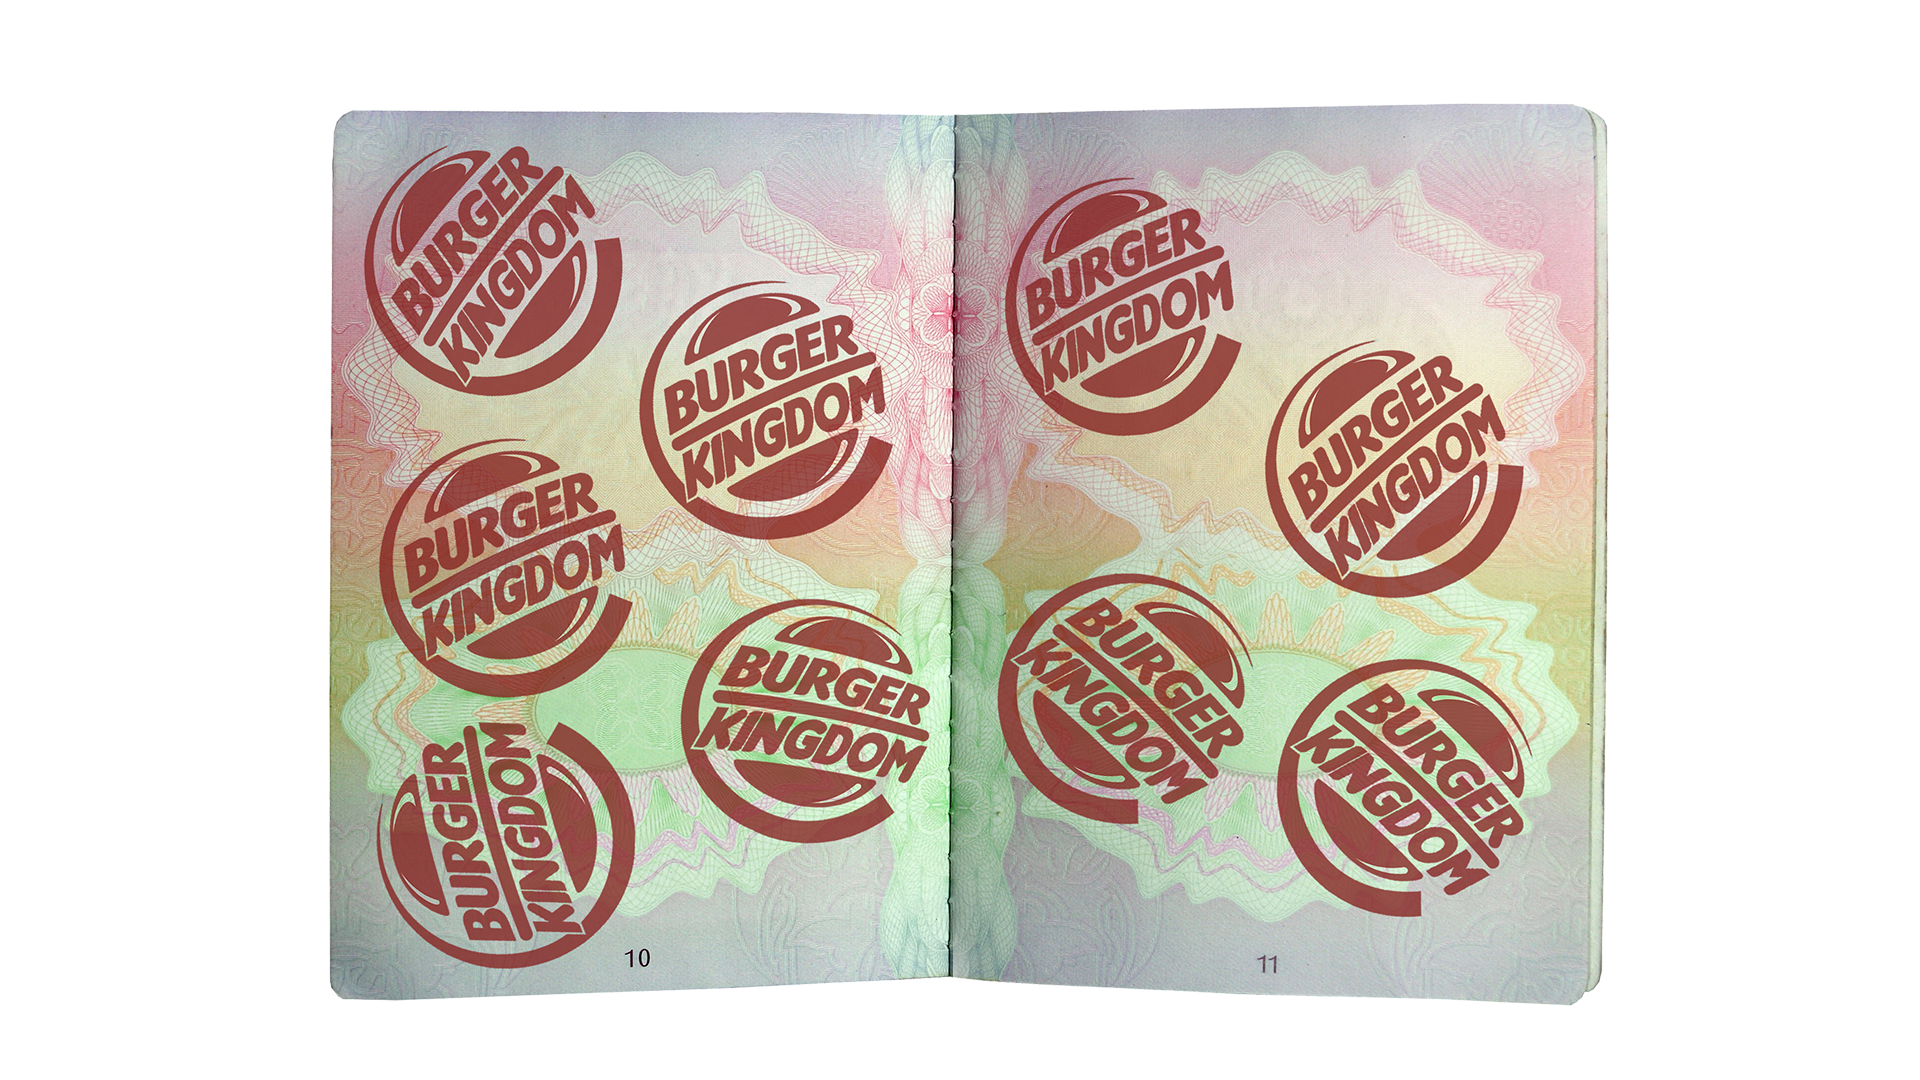 BK_Passport_Int_Transparent.png